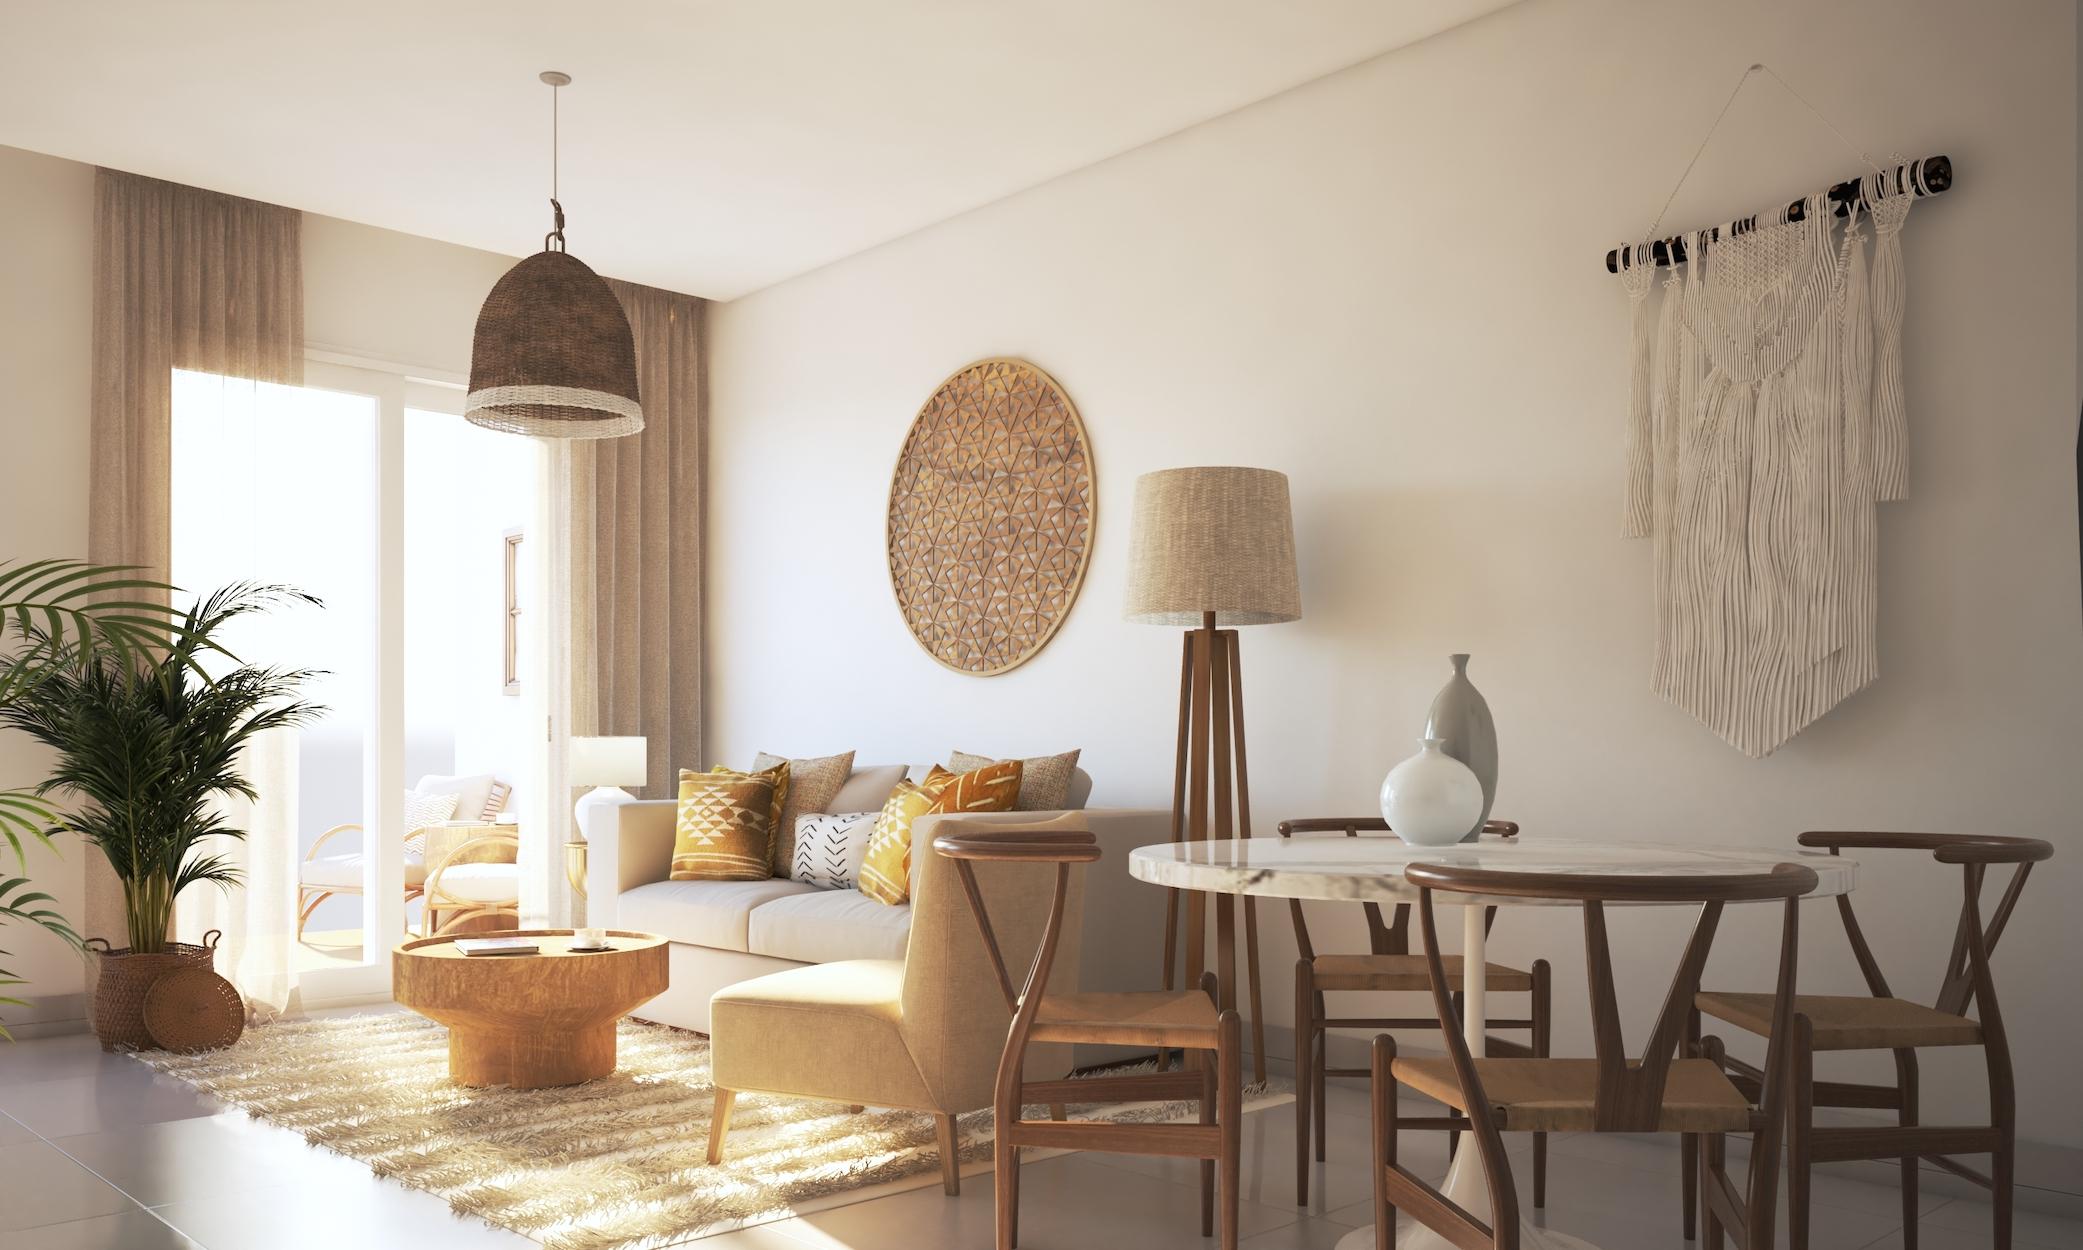 Efreshli - Design